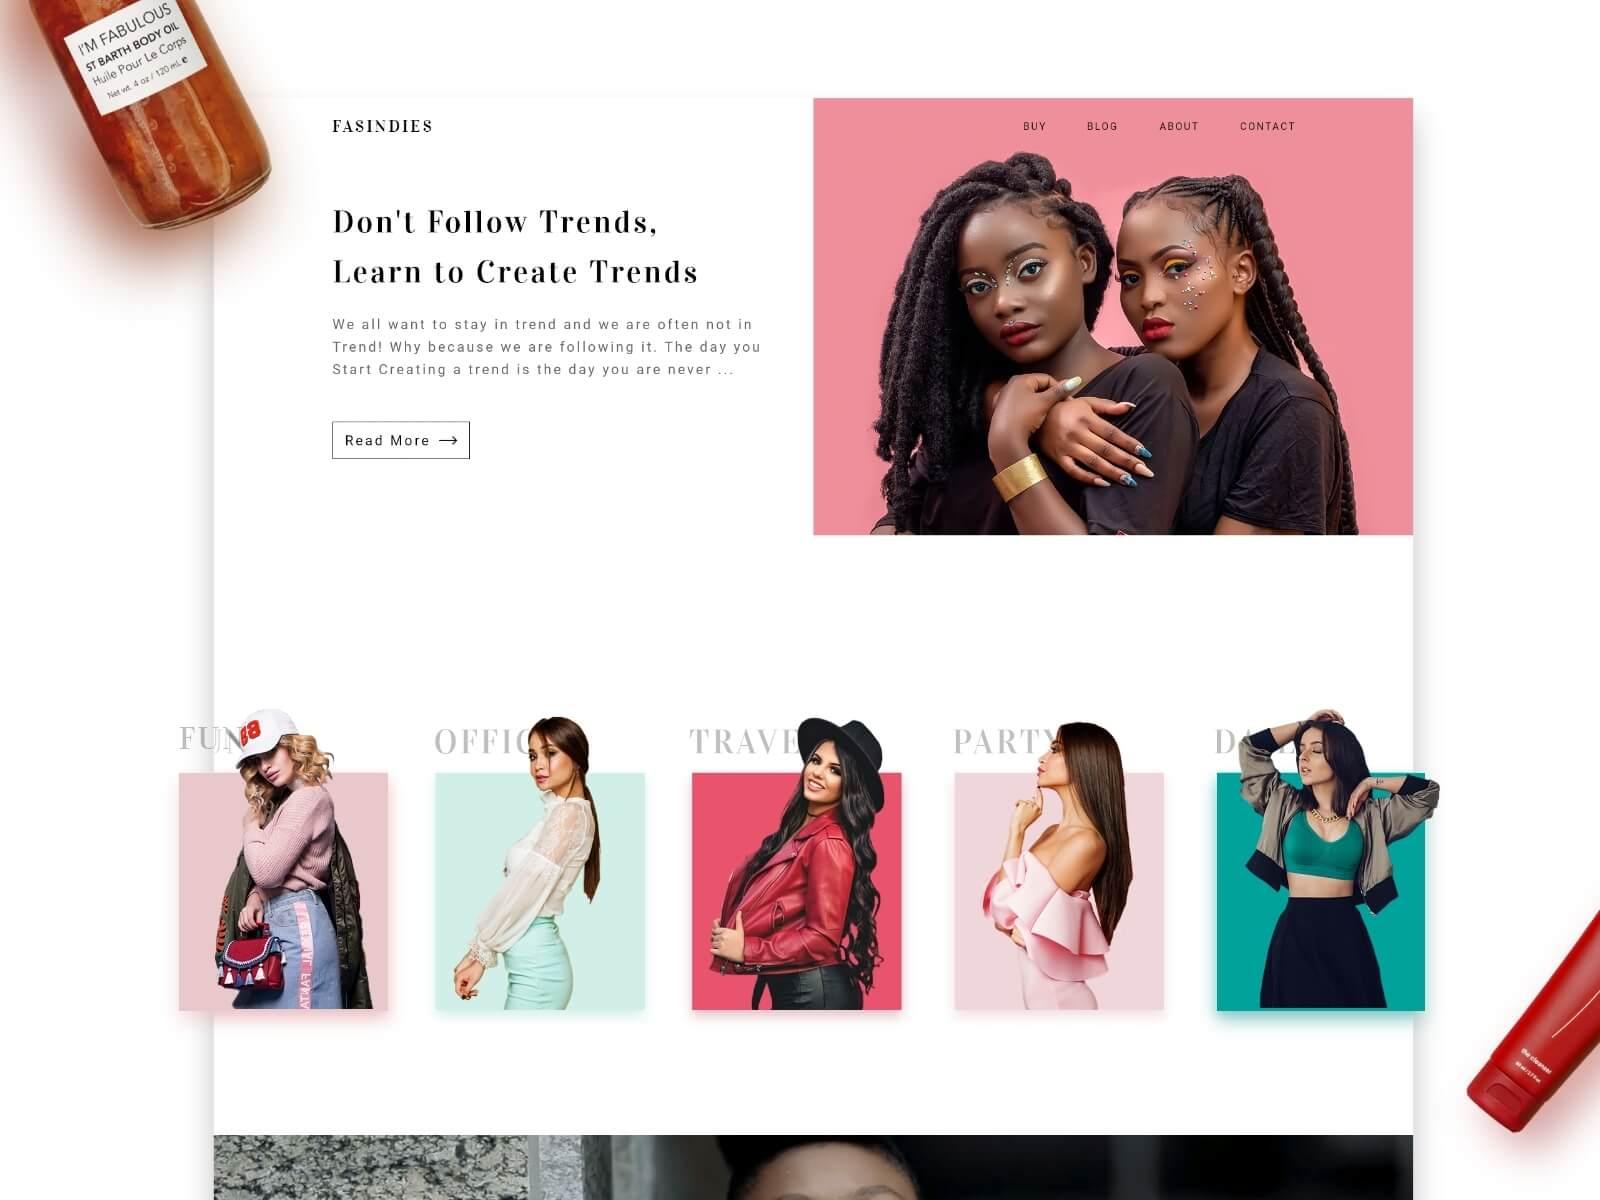 Fashion Blog interaction Design by Hiten Rajgor